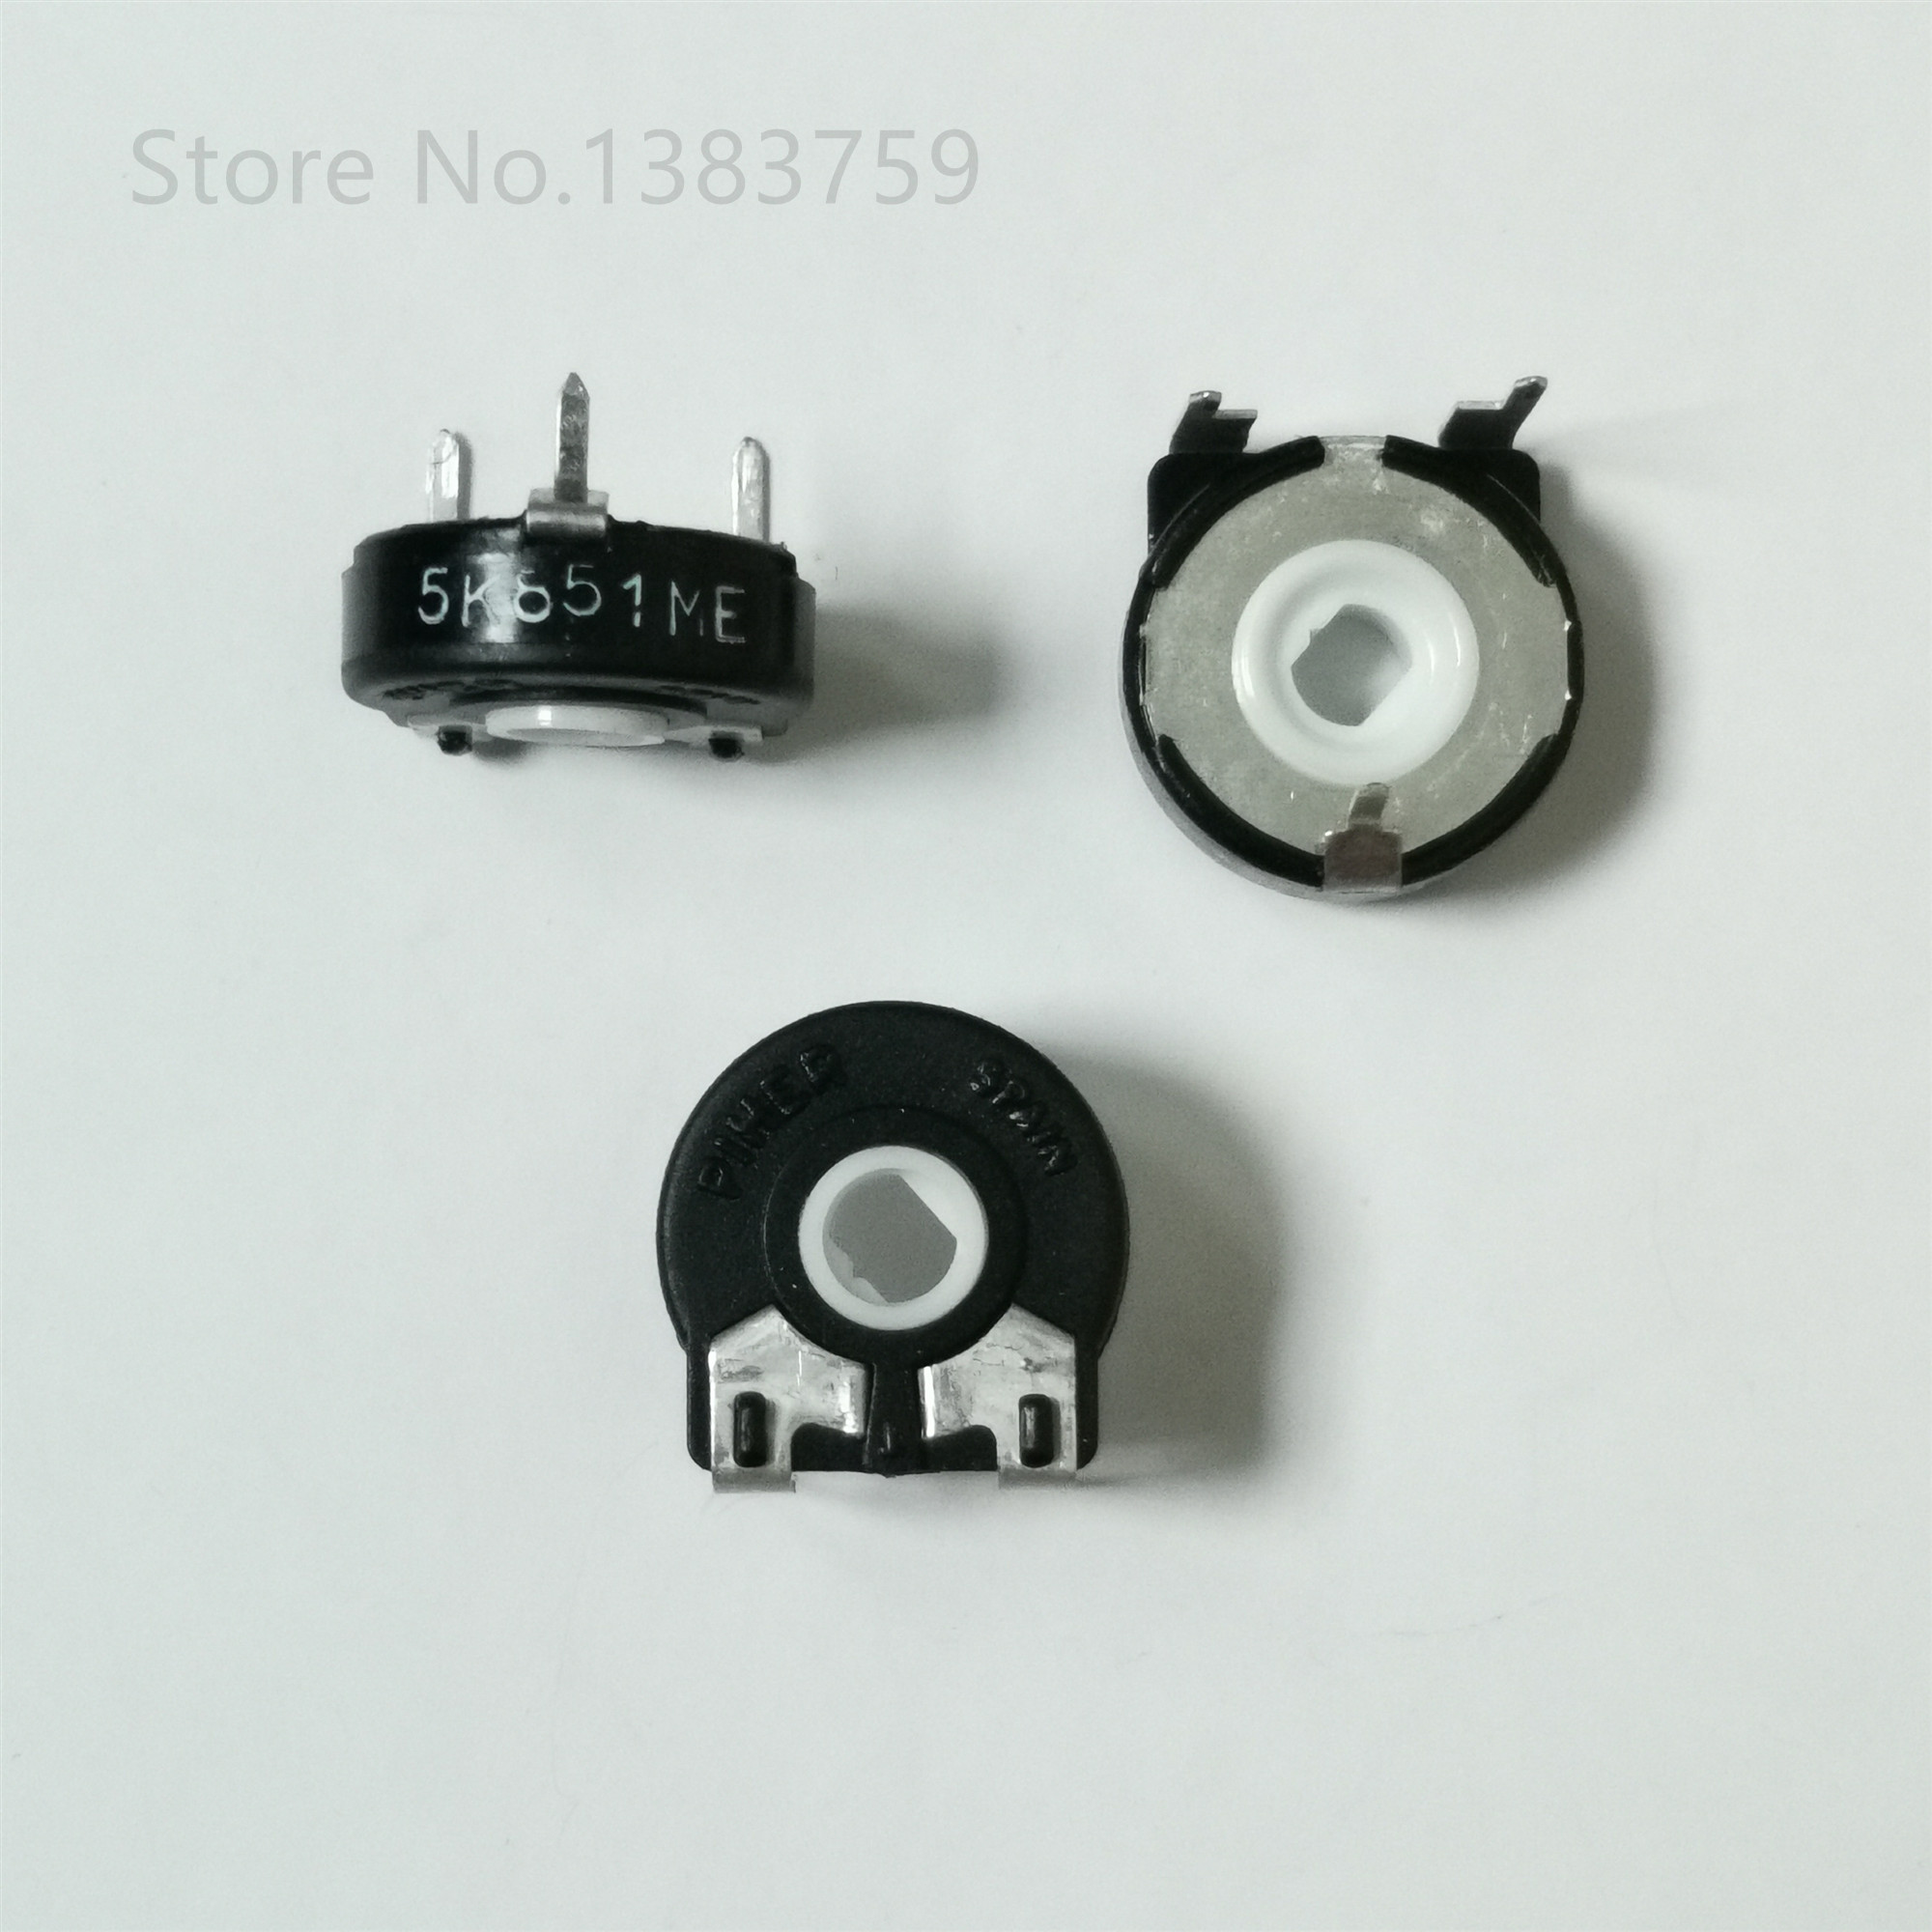 5pcs potenciômetro PT15-1K 5 k 10 k 20 k 50 k 100 k resistor ajustável horizontal